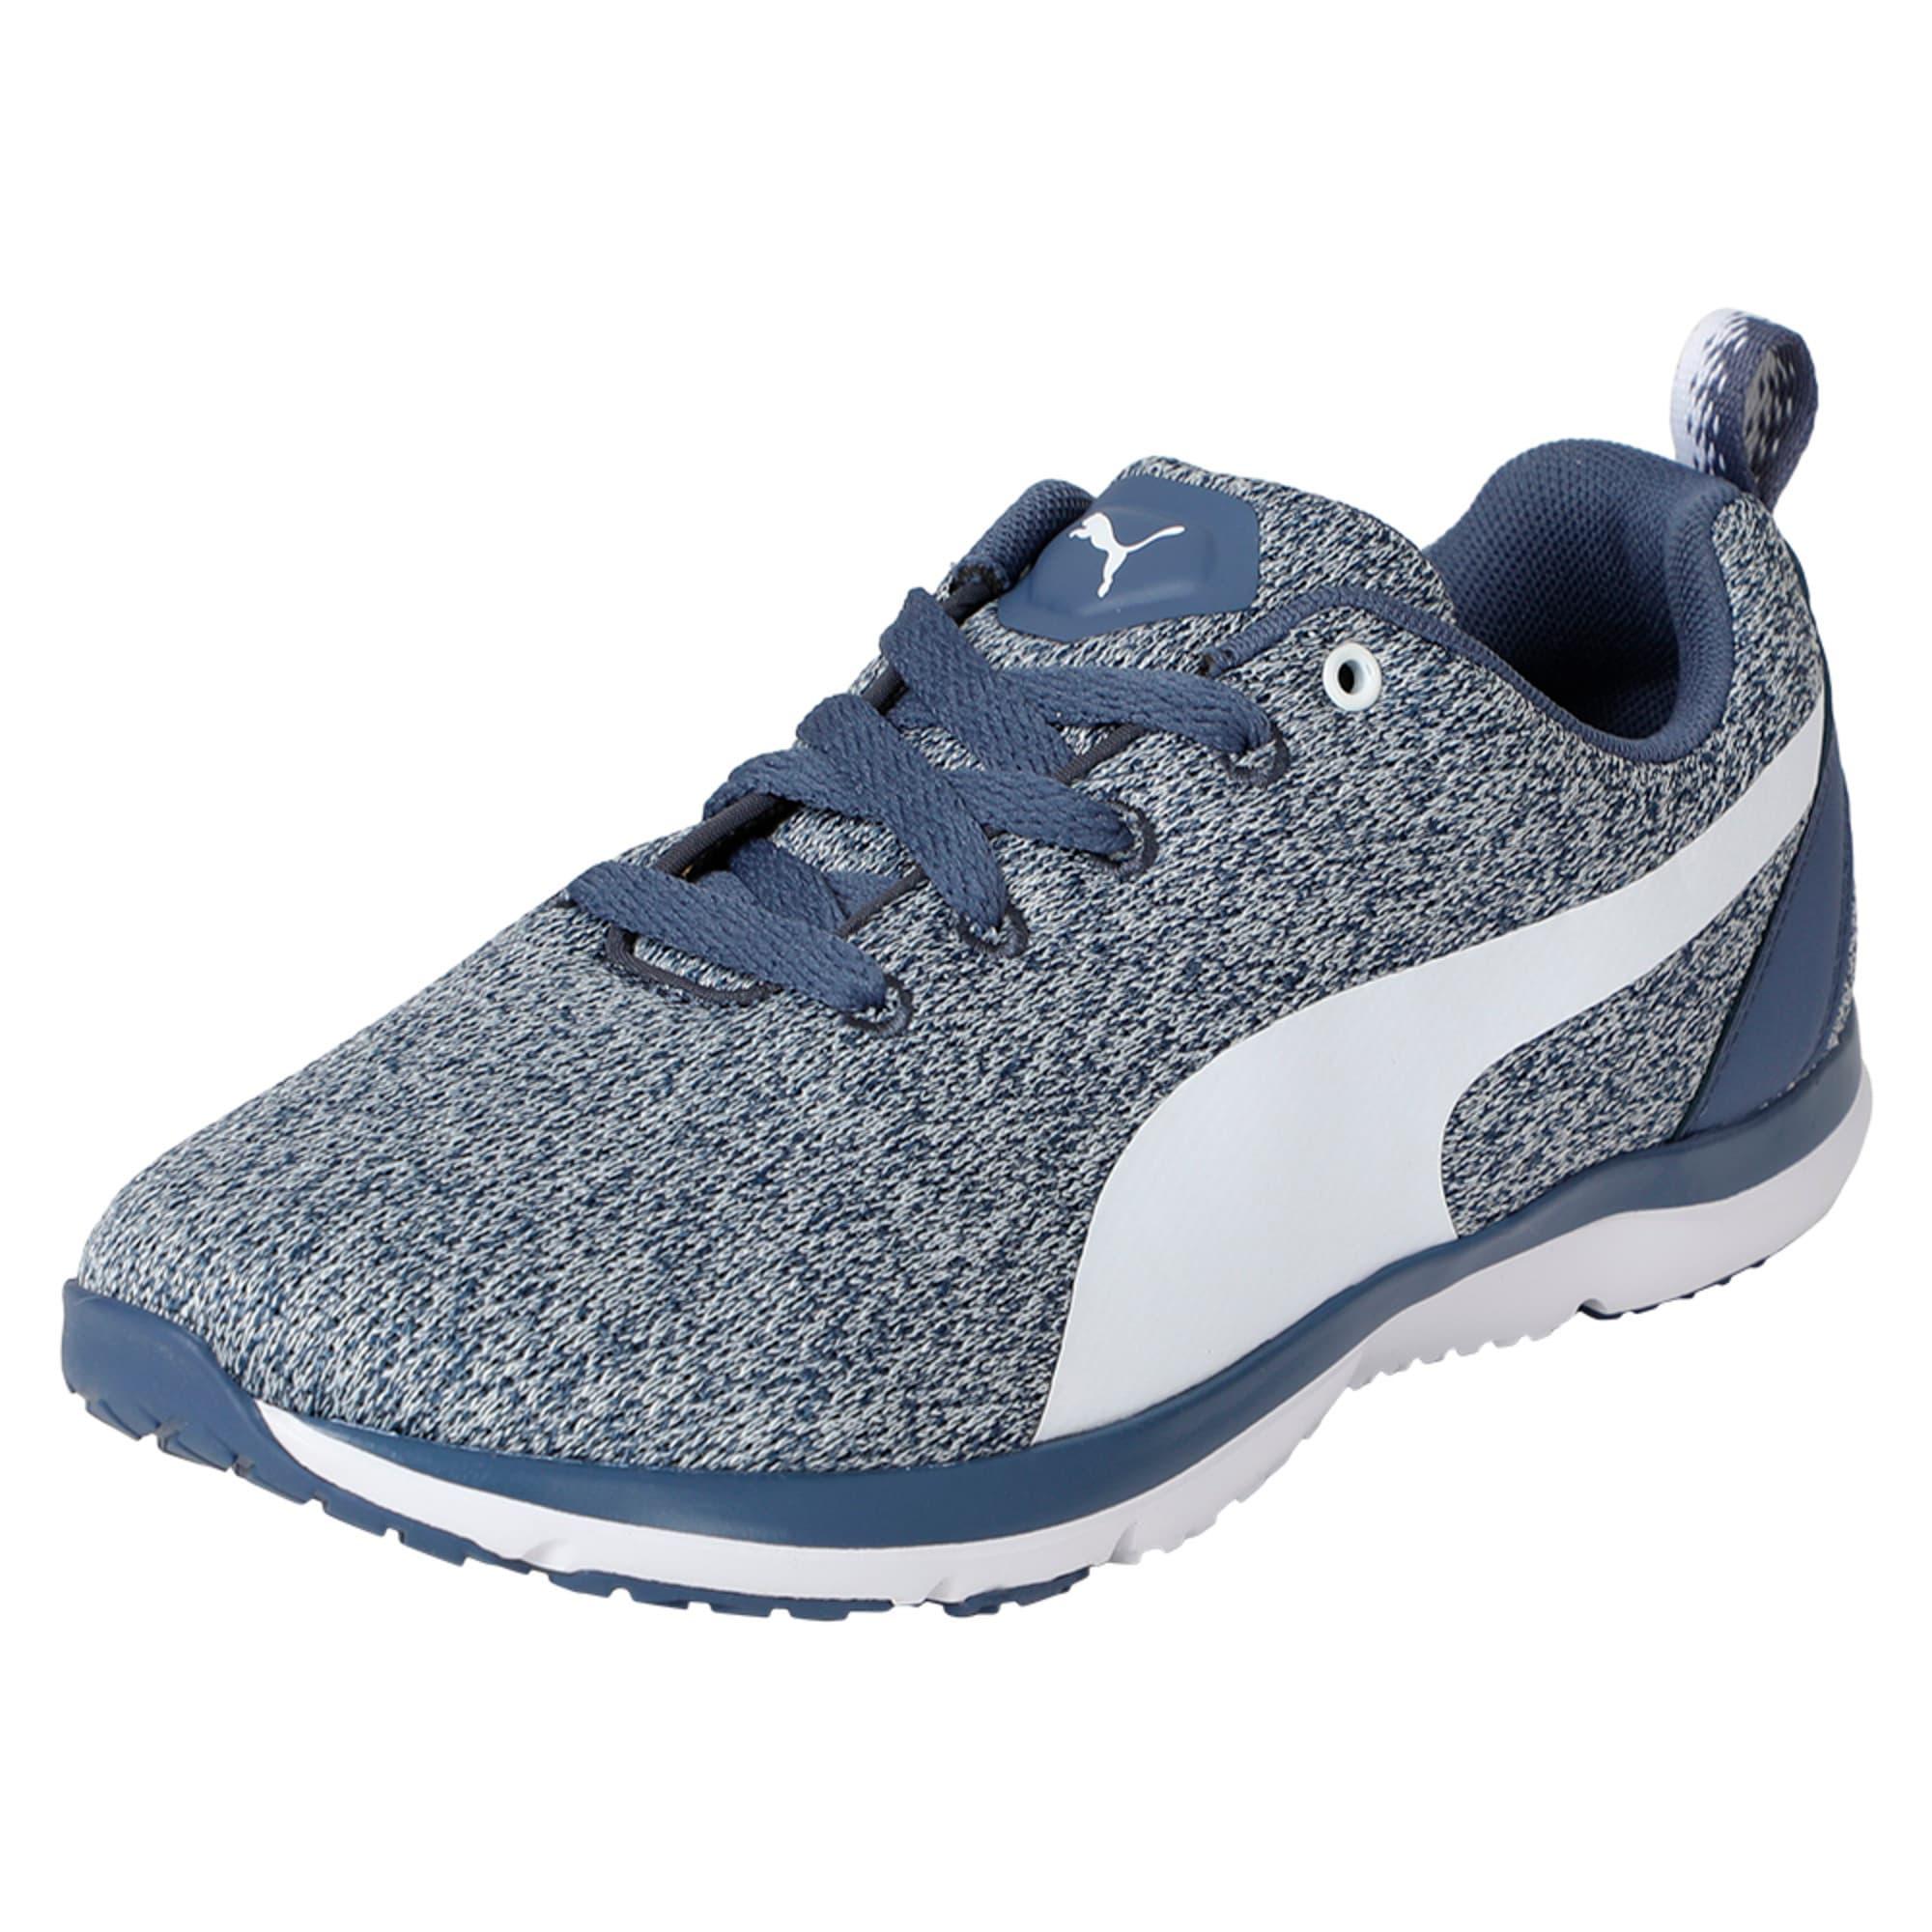 Thumbnail 1 of Flex XT Knit Women's Training Shoes, Blue Indigo-Puma White, medium-IND